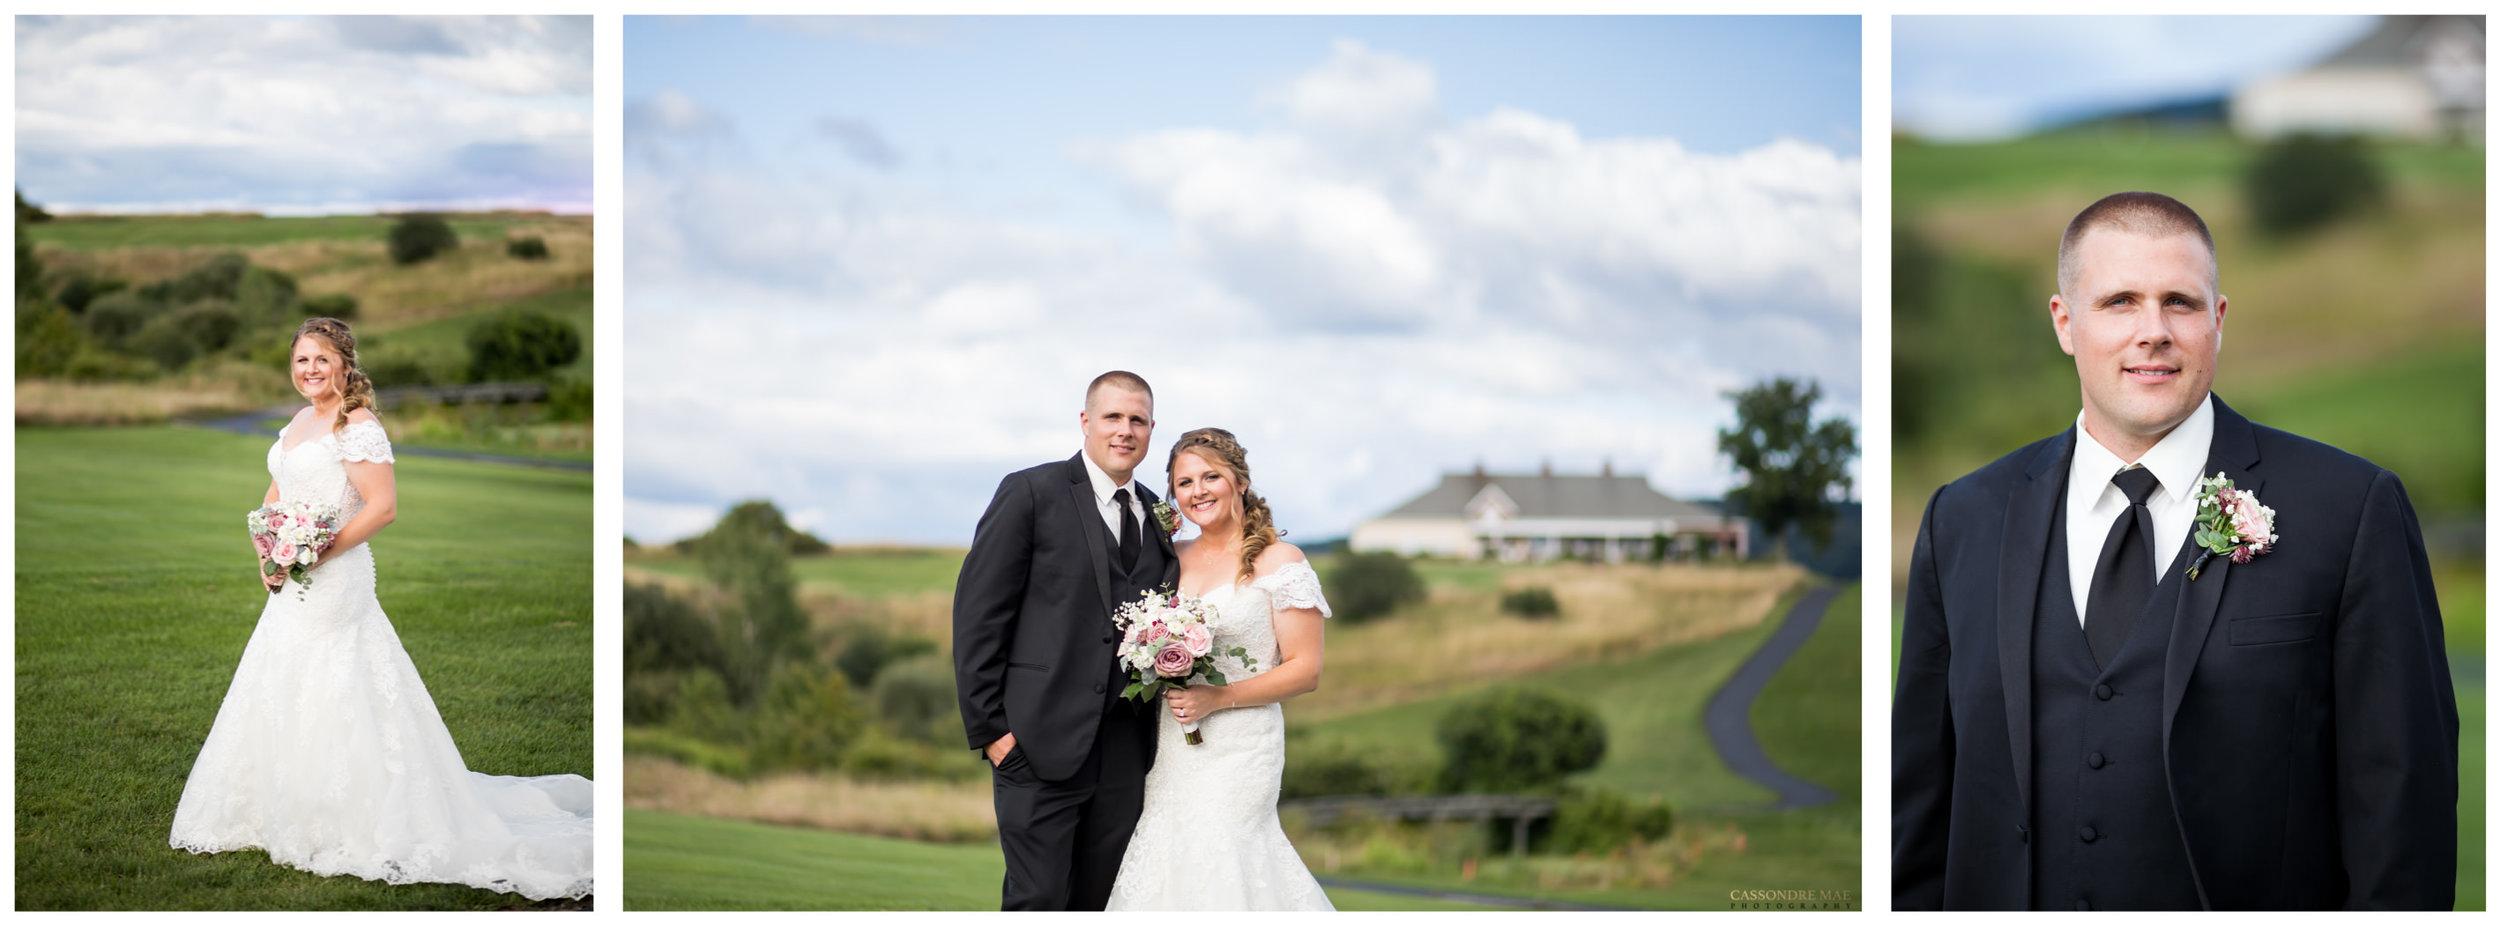 Cassondre Mae Photography Hudson Valley Wedding Photographer 2.jpg